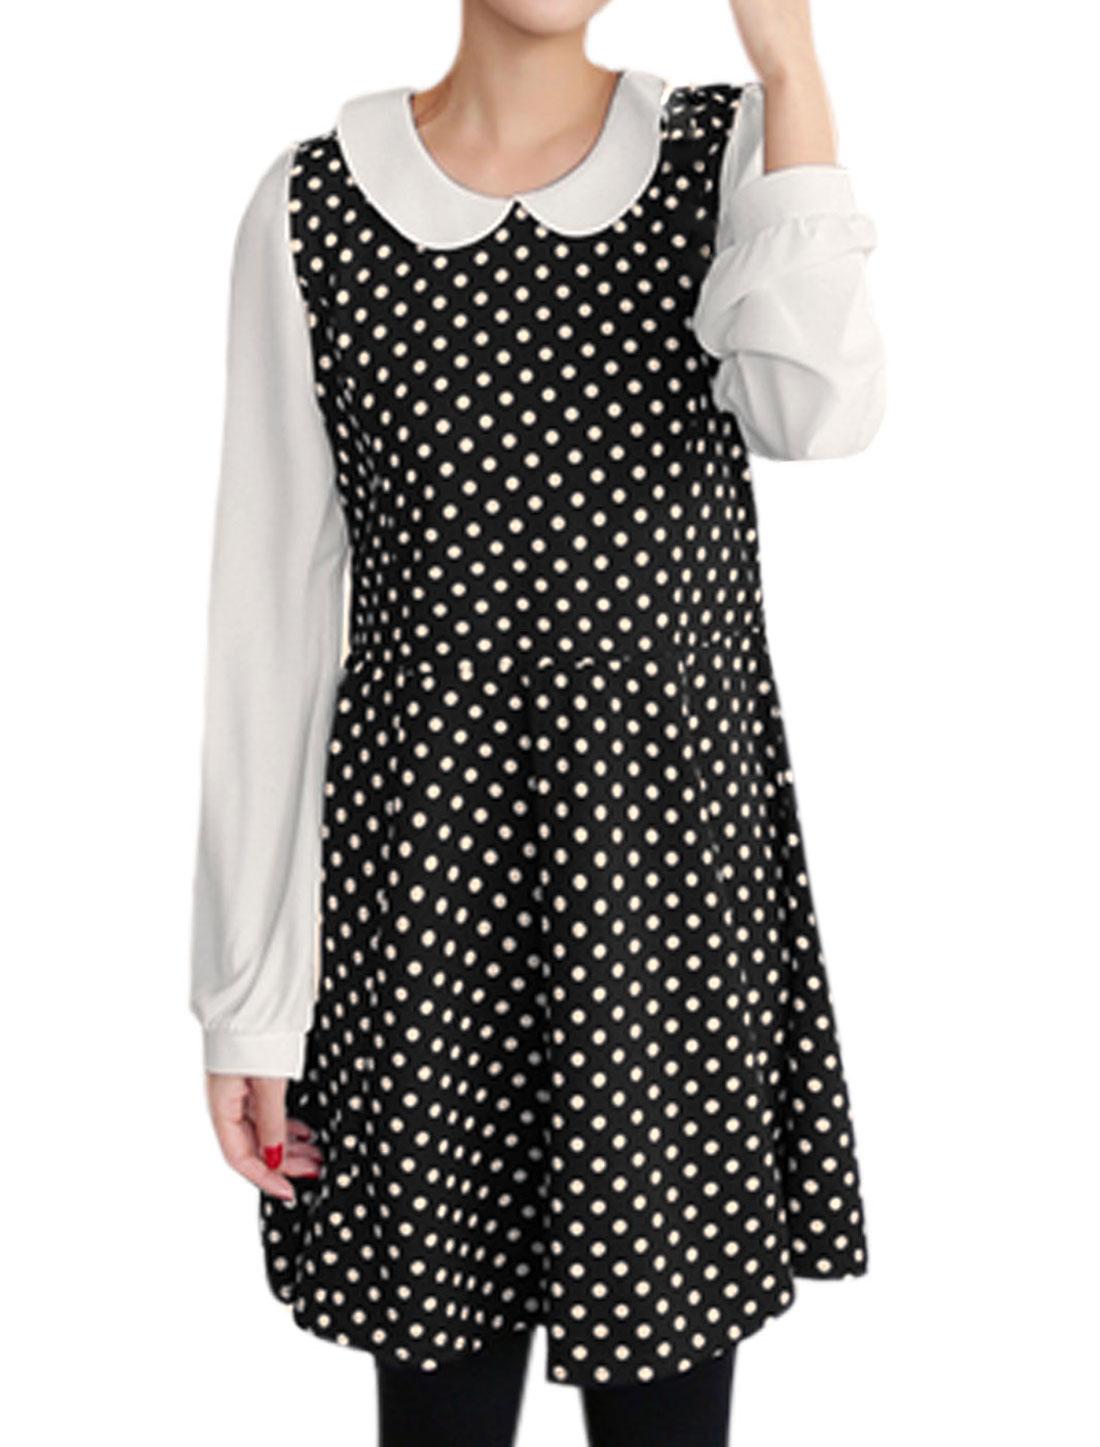 Lady Peter Pan Collar Dots Pattern Fashion Casual Dress Black White M